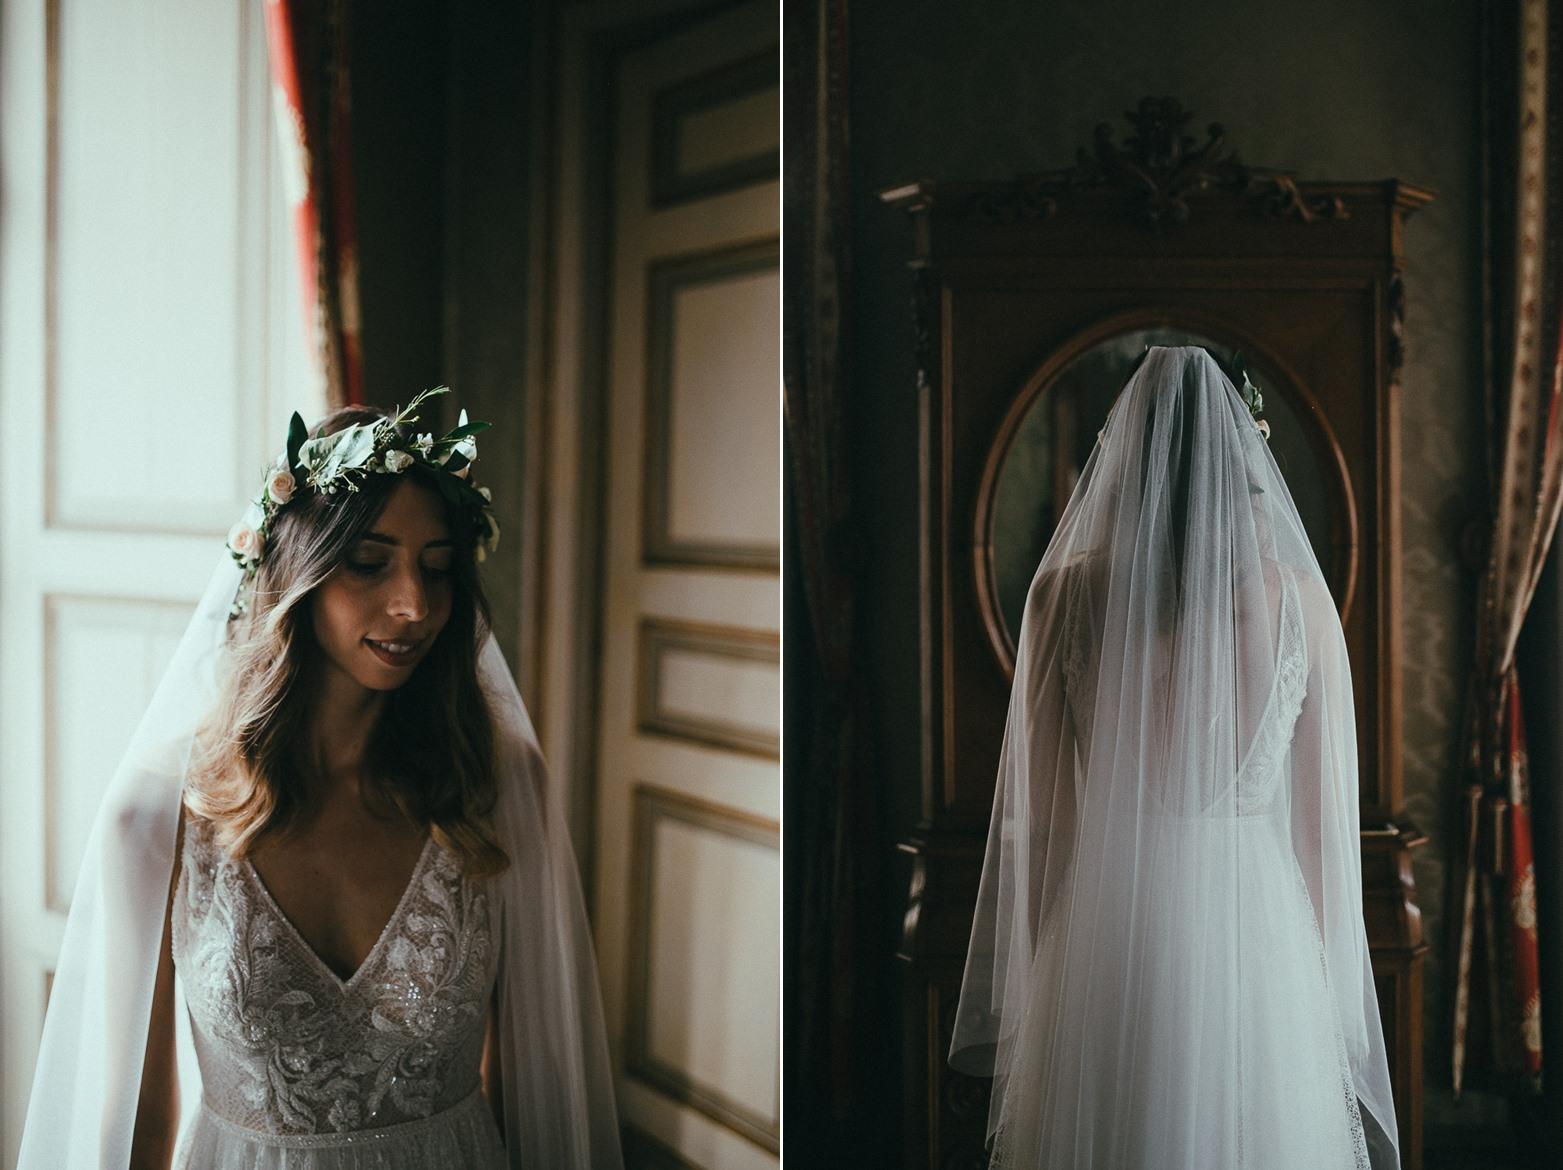 42-bride-portrait.jpg